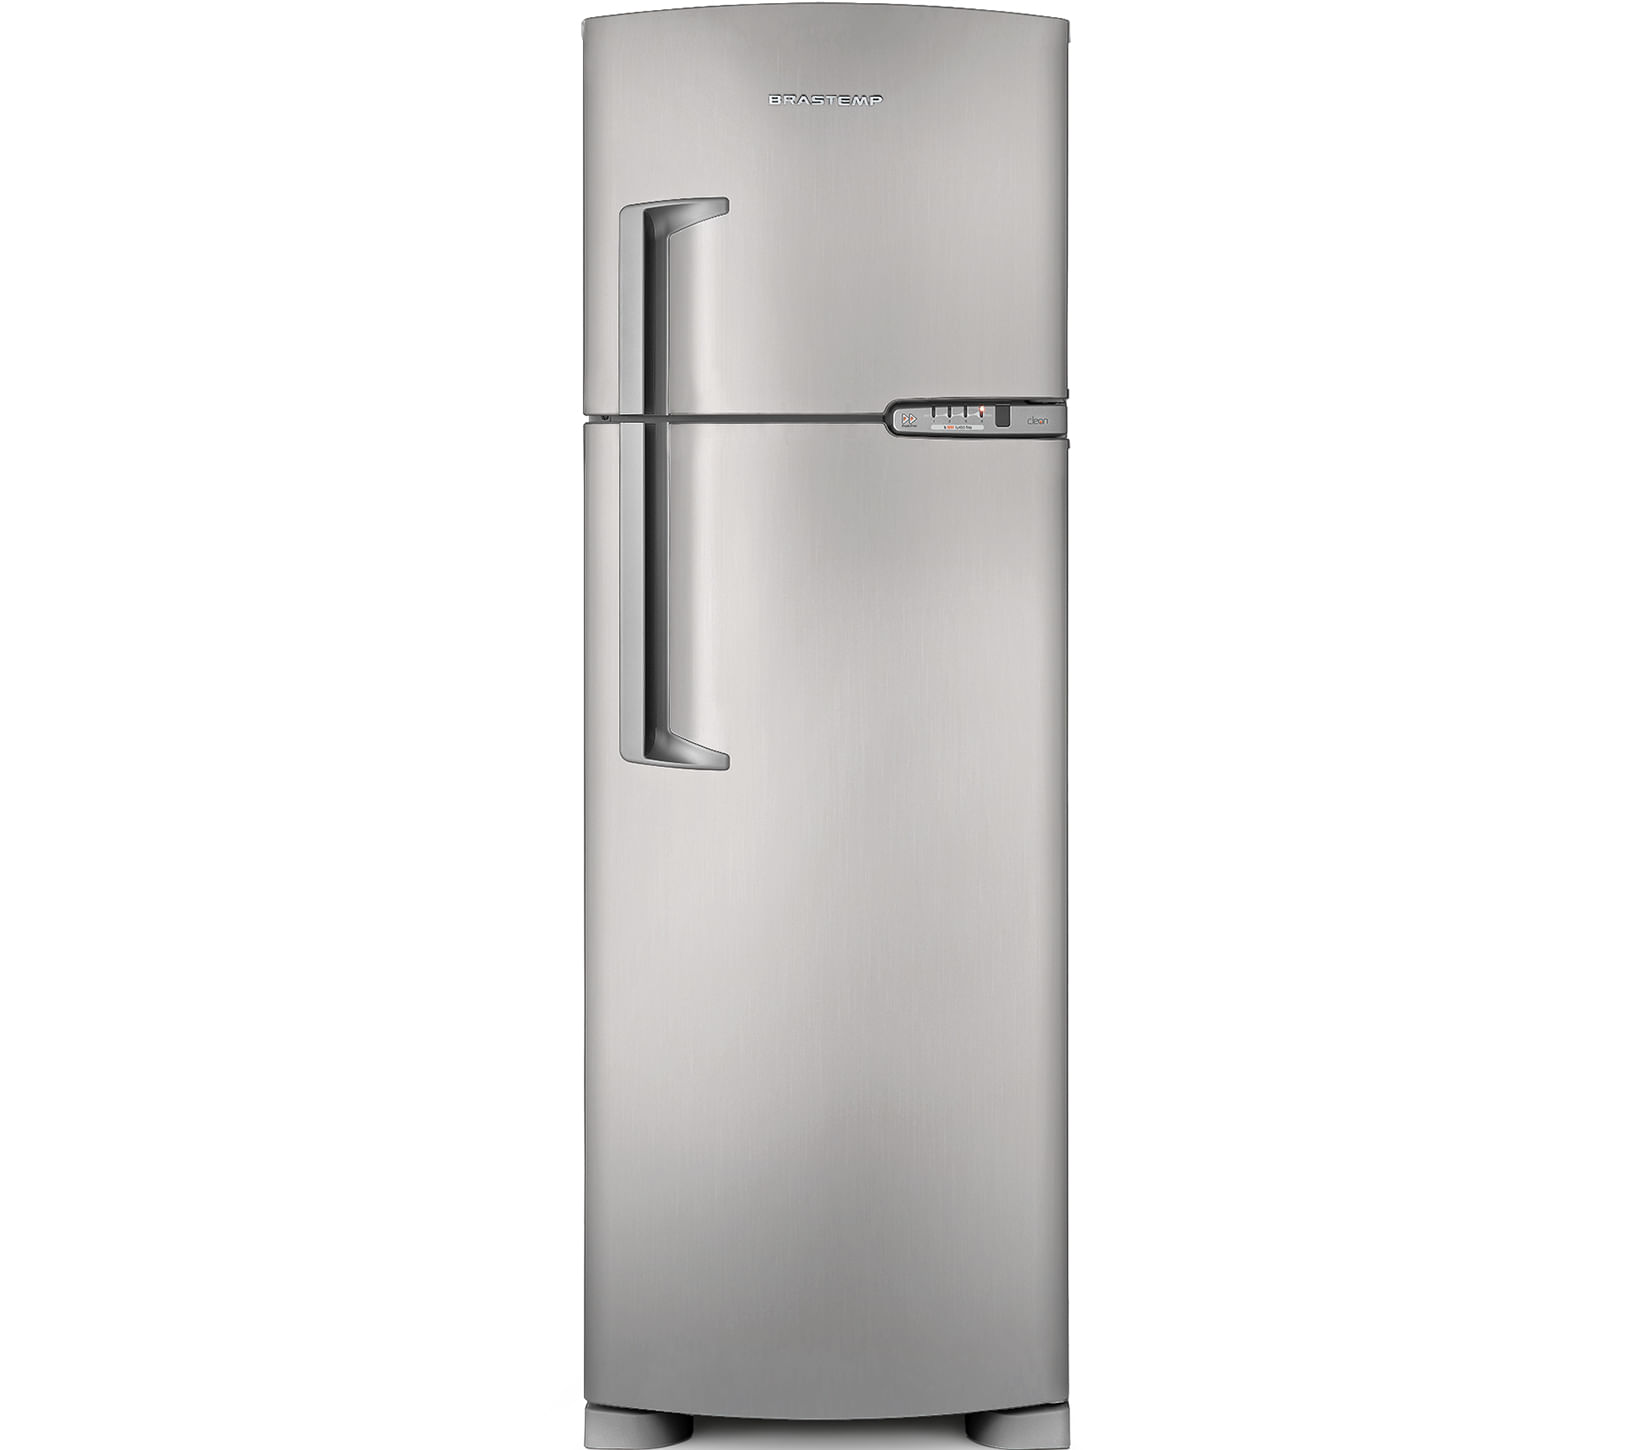 a847605f9 BrastempGeladeira Brastemp Frost Free Duplex 378 litros cor Inox com  Porta-Latas prateleiraPrincipal